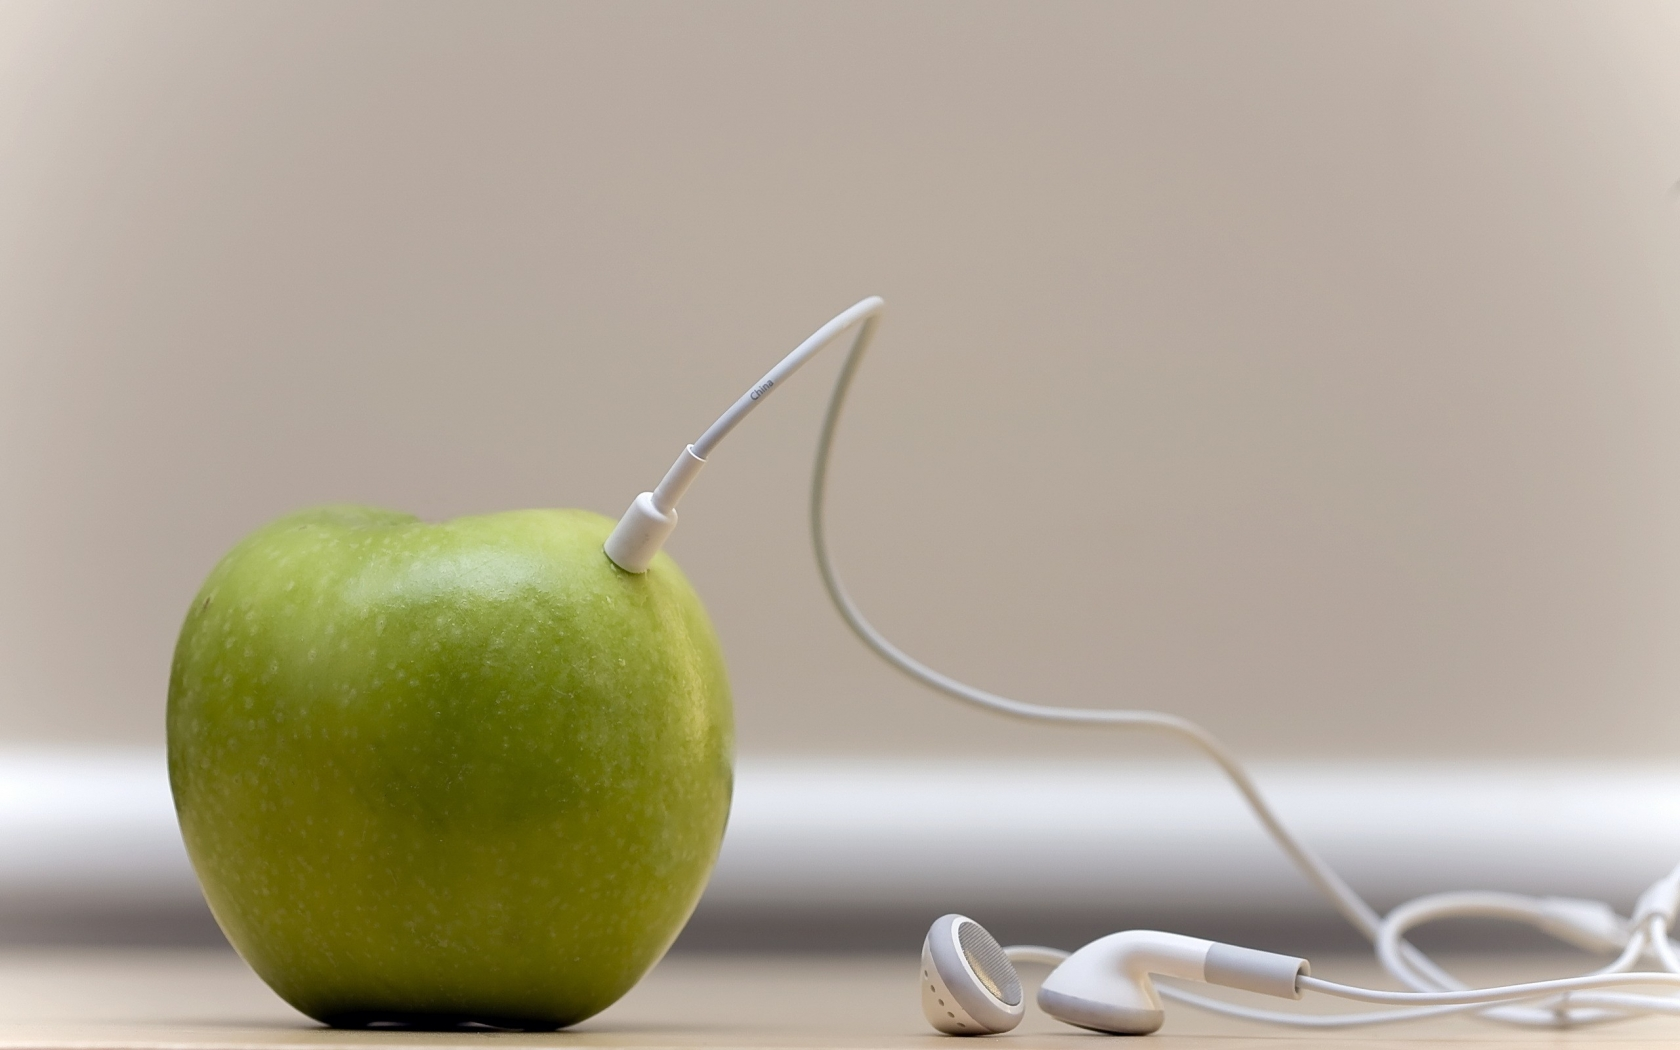 Parodia de Apple - 1680x1050